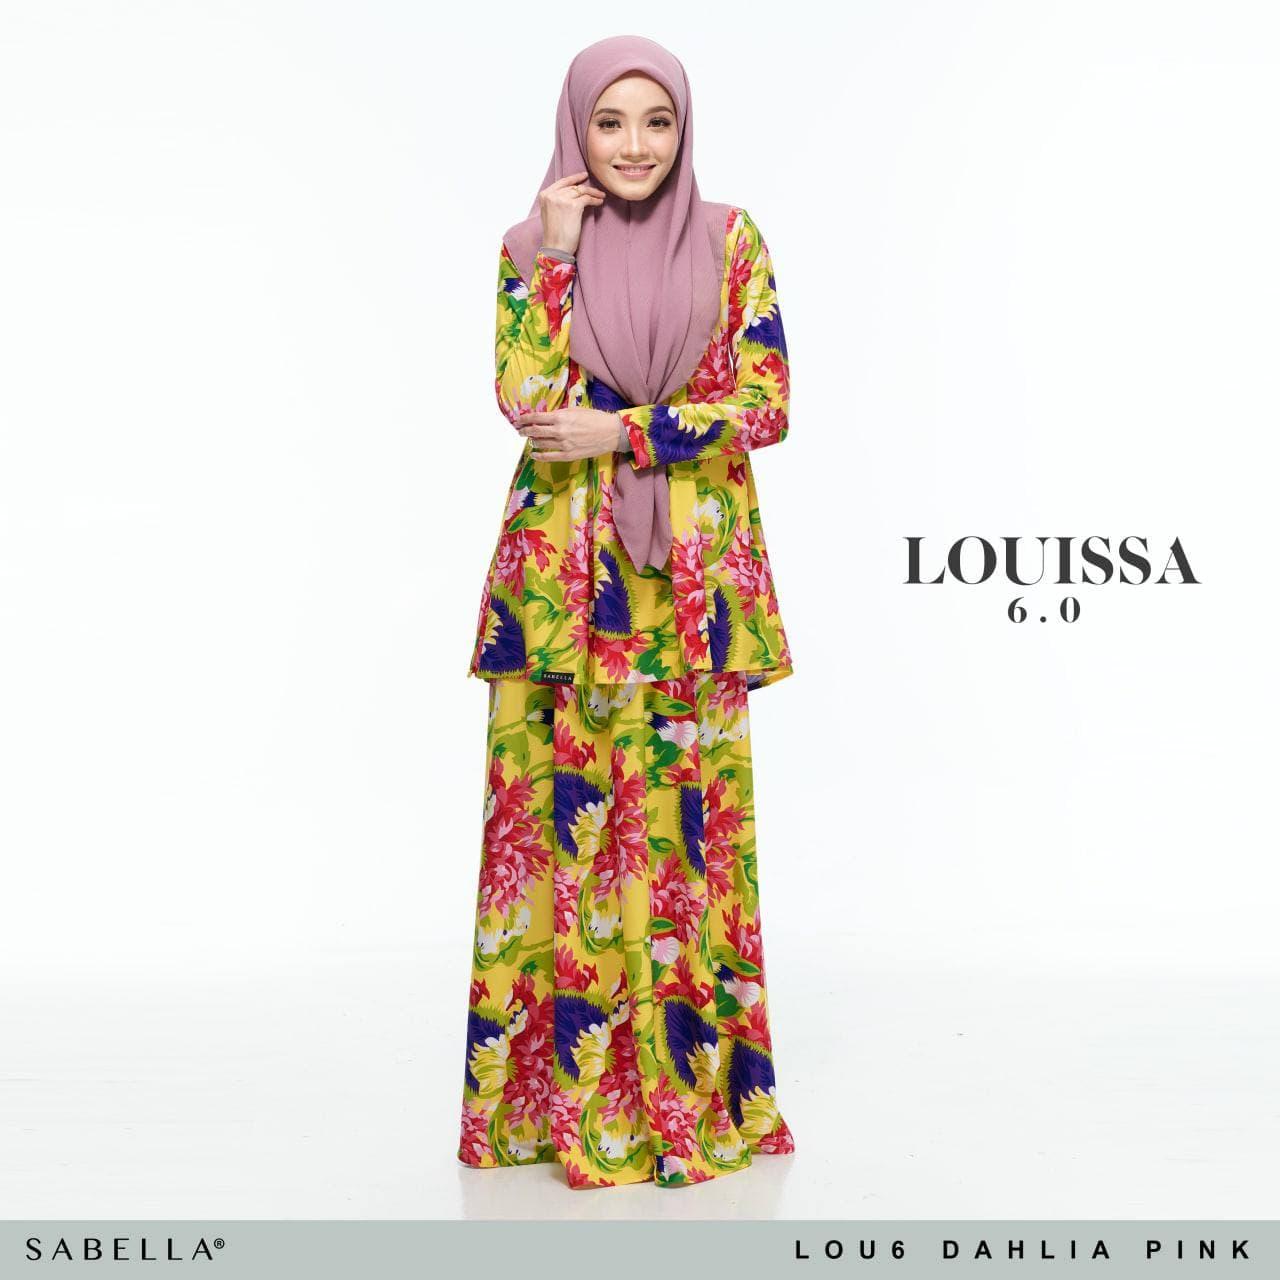 Louissa 6.0 Dahlia Pink